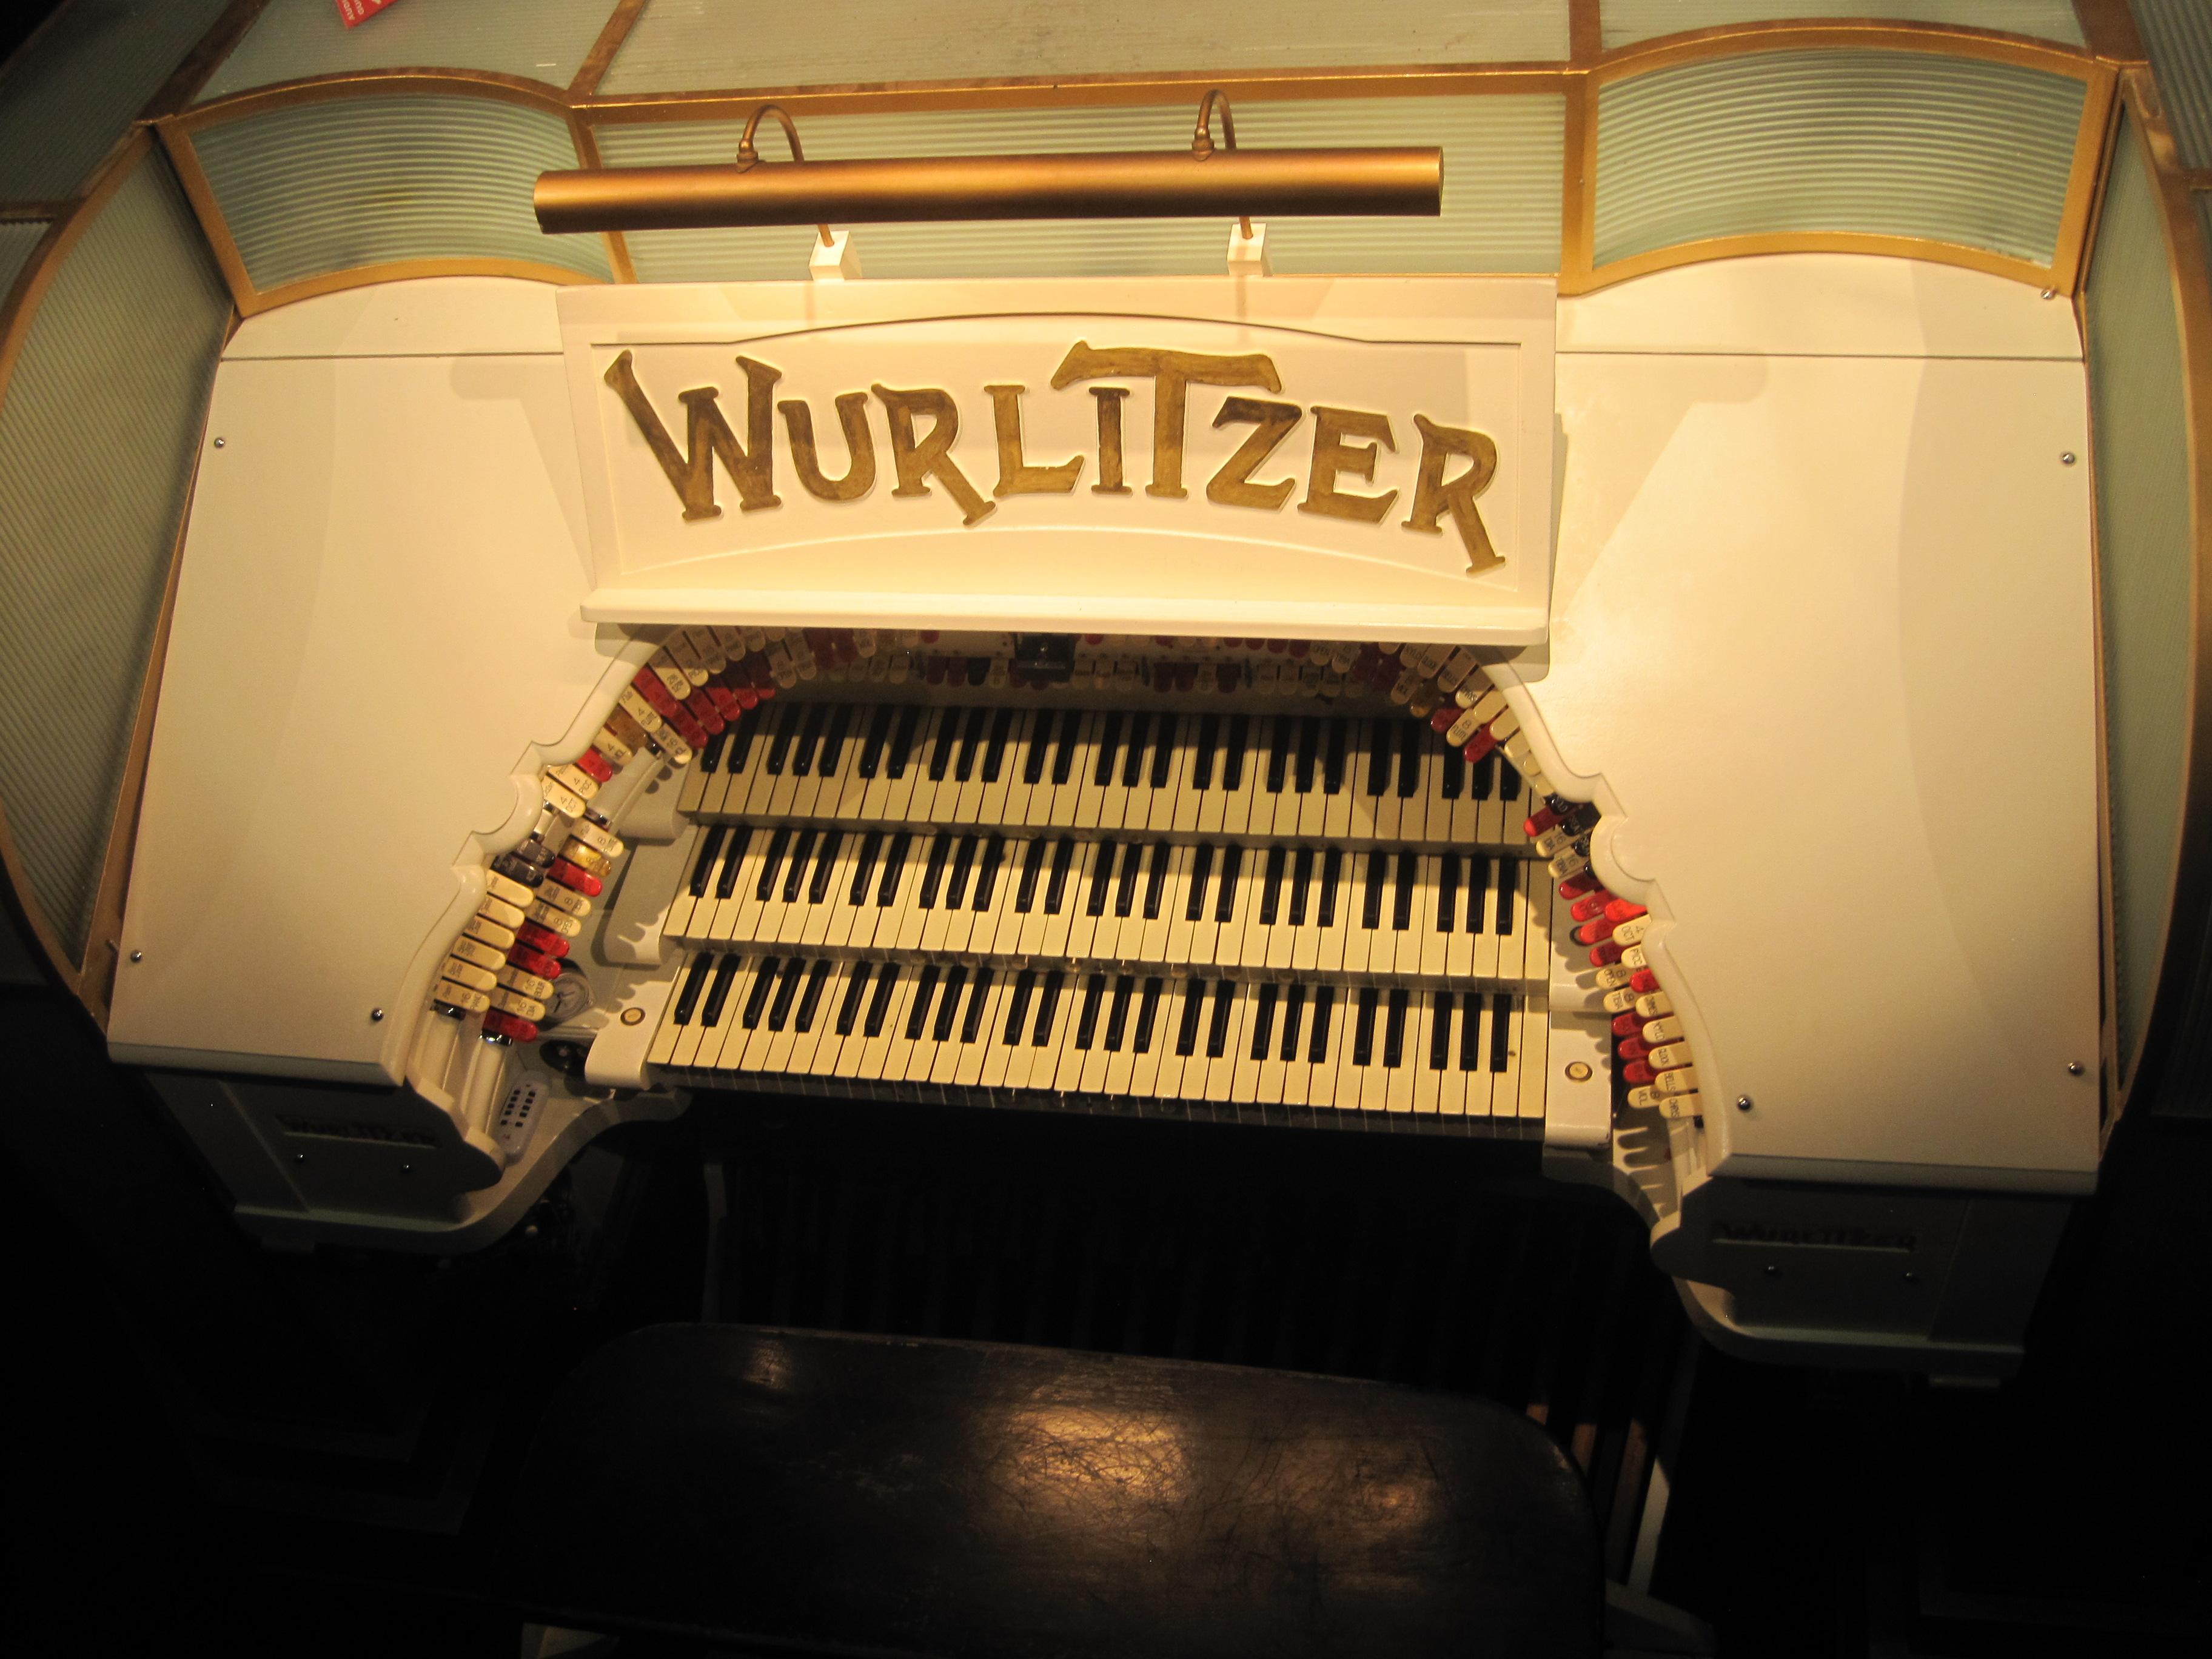 The Mighty Wurlitzer – photo by Juliamaud